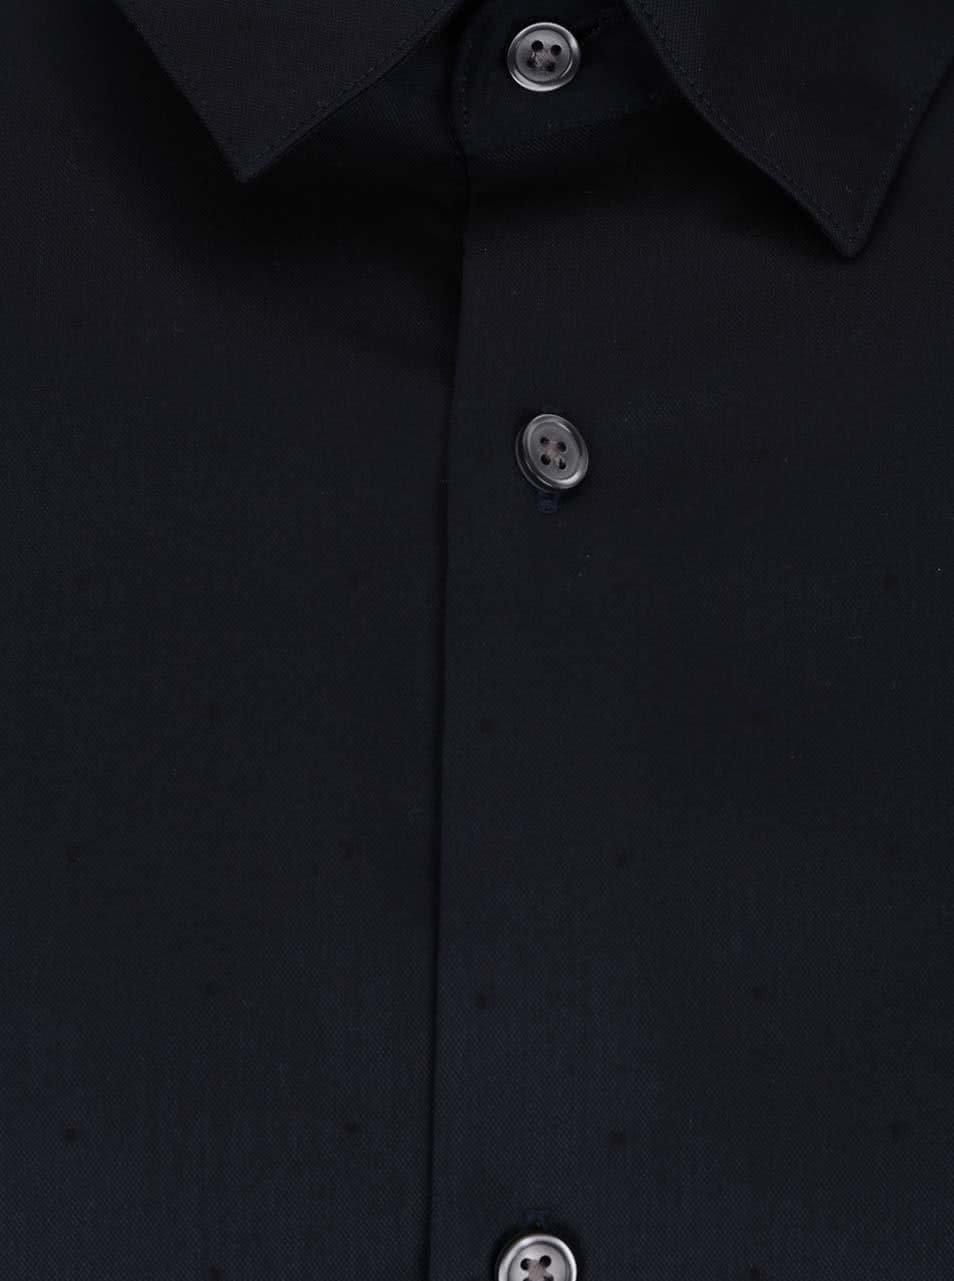 cebac7da1b05 Tmavomodrá formálna košeľa Jack   Jones Premium Jake ...